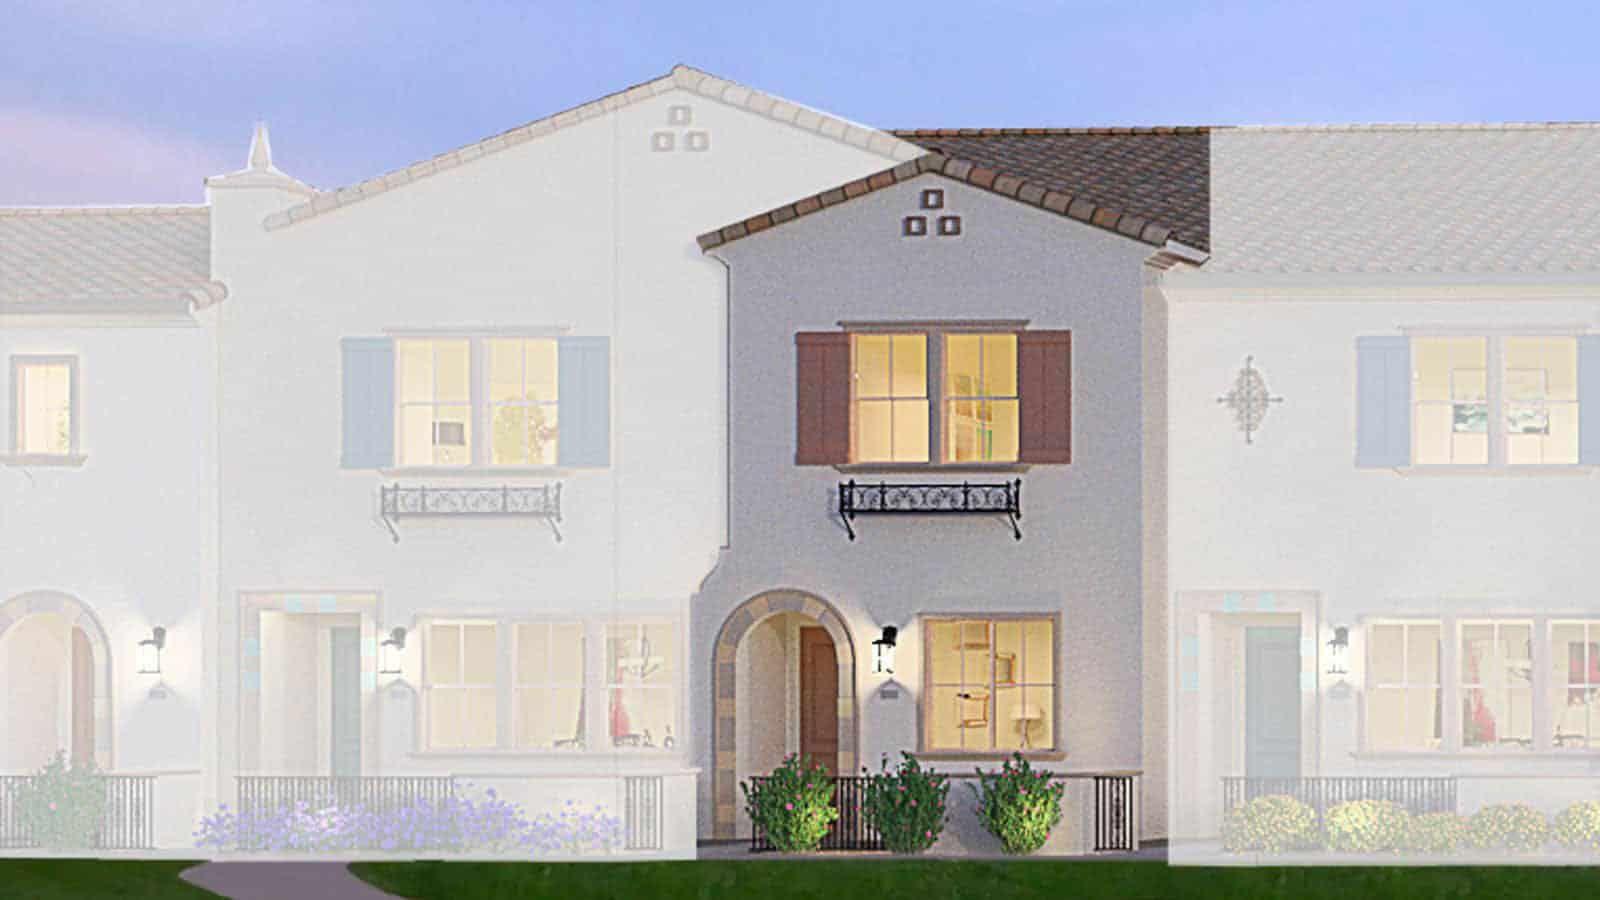 Residence 1 Spanish Elevation Rendering